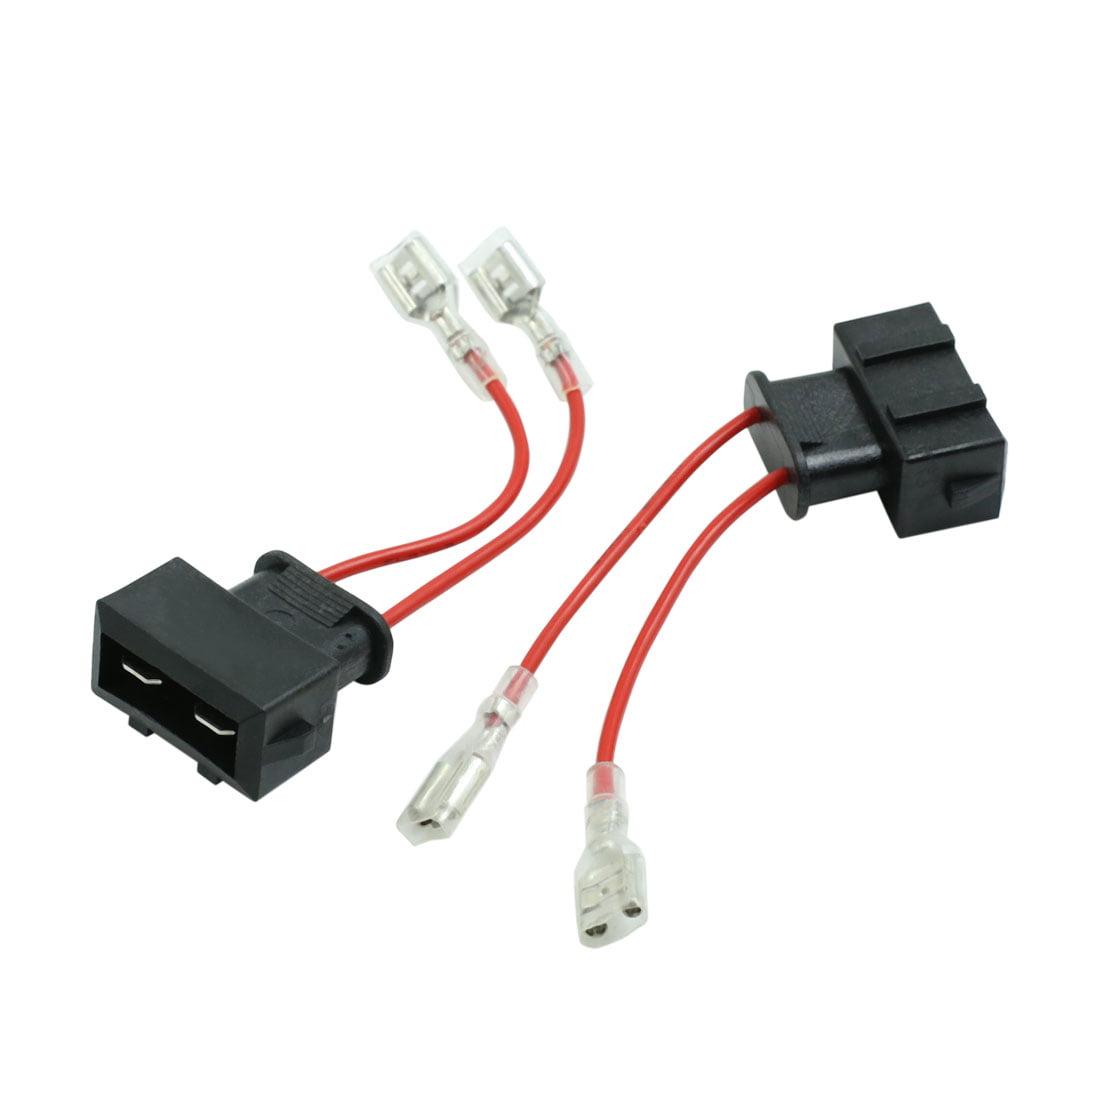 DC 12V Car Speaker Wire Harness Adapter Connector for Volkswagen Passat 2pcs - image 1 de 4